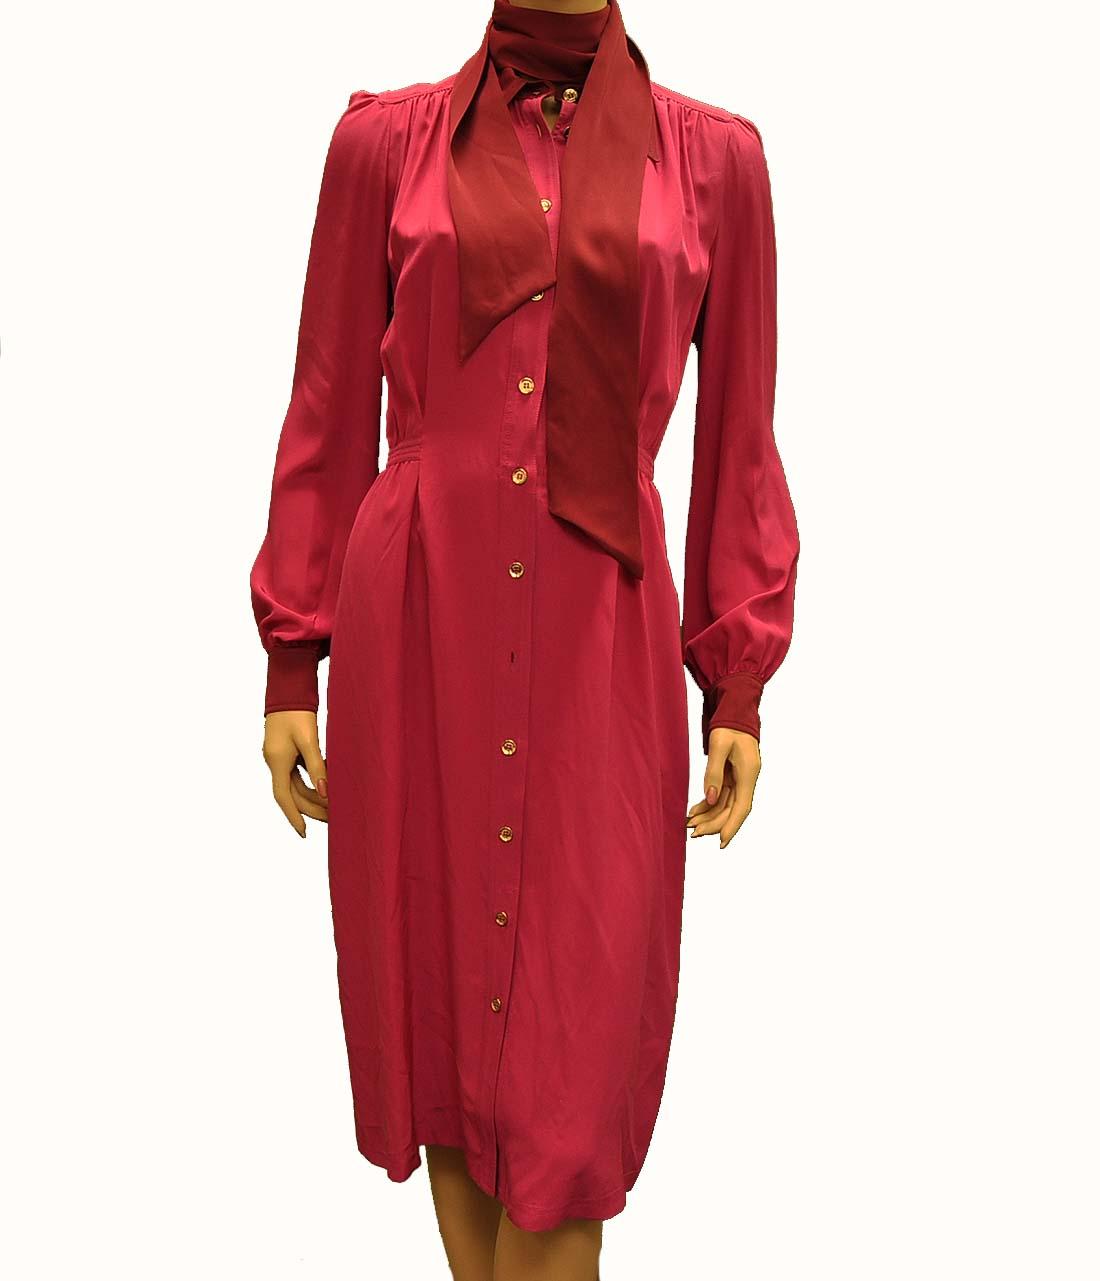 Gucci Pink Silk Knee Length Dress